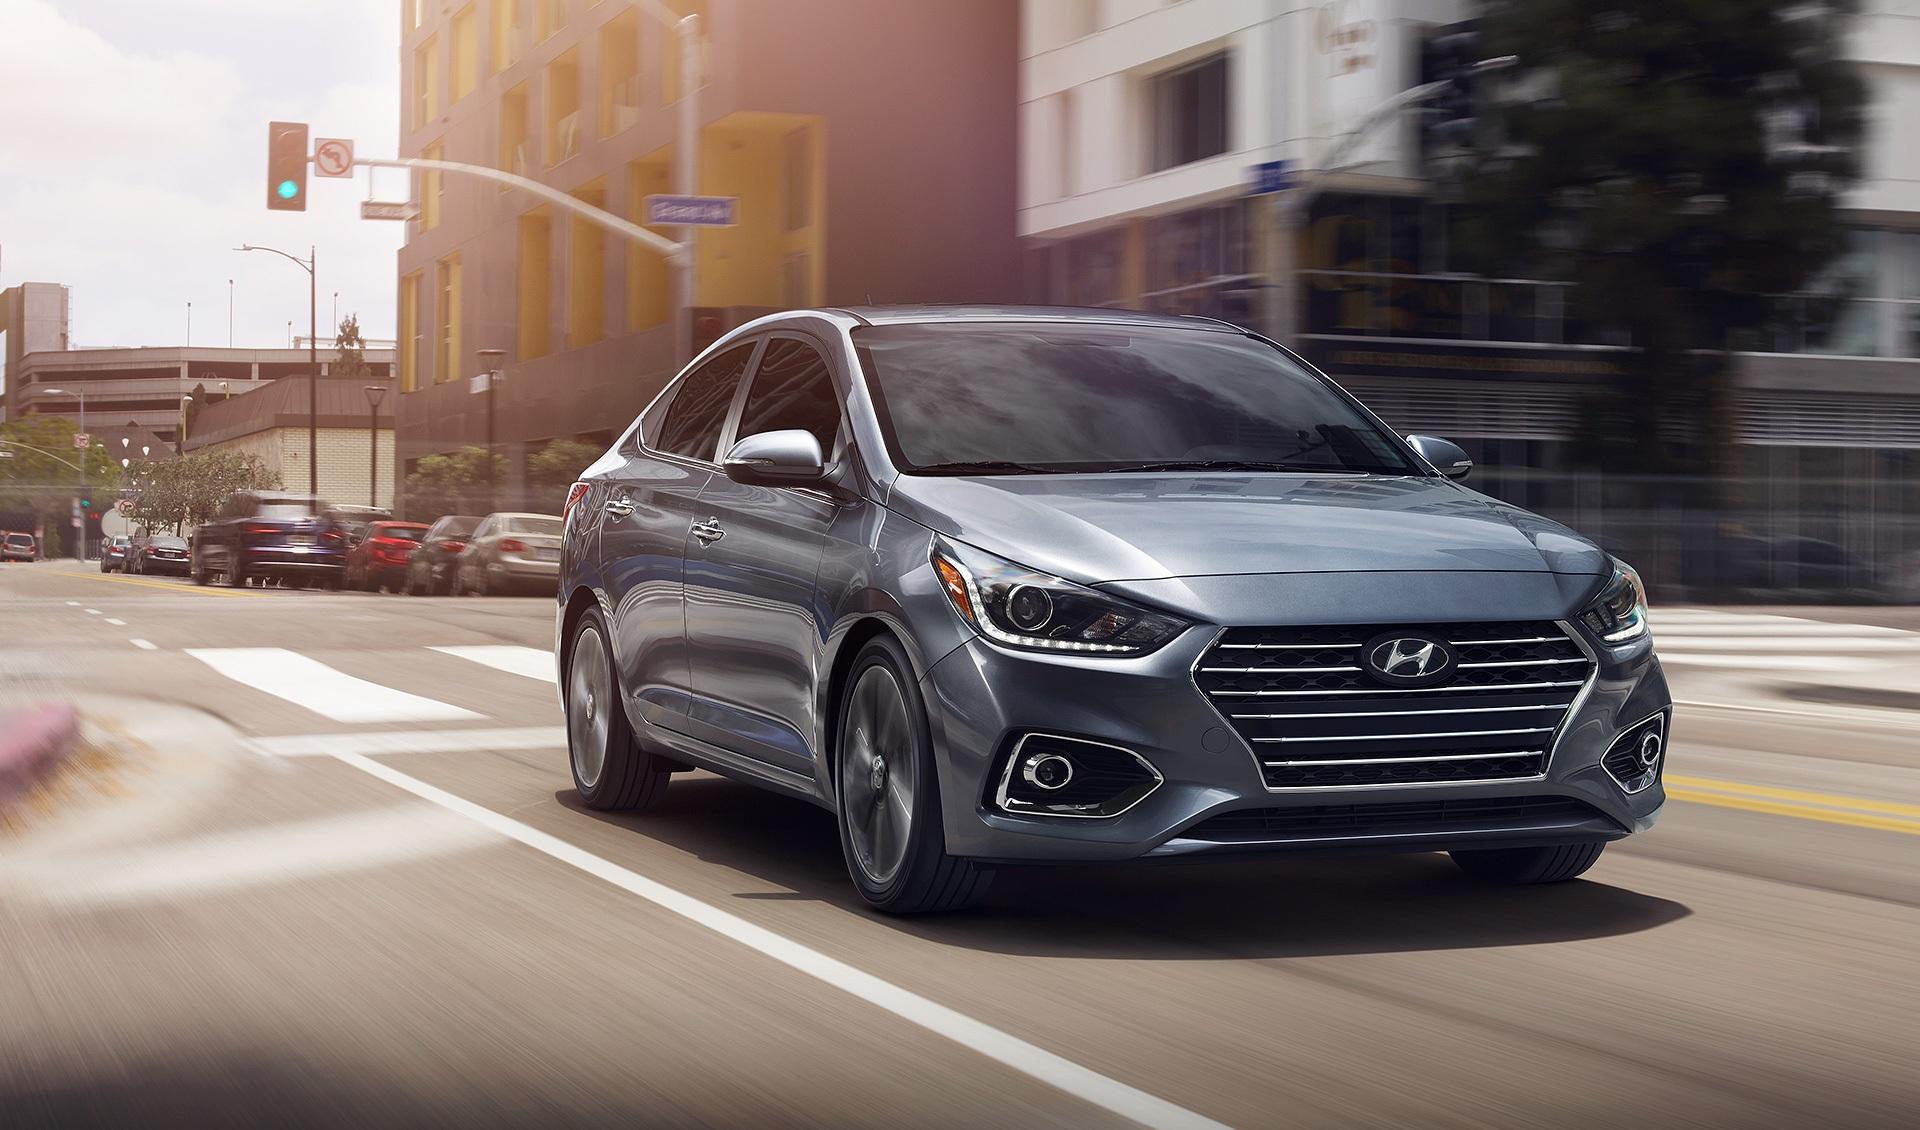 Hyundai Accent 2020 1.6L Base in UAE: New Car Prices ...